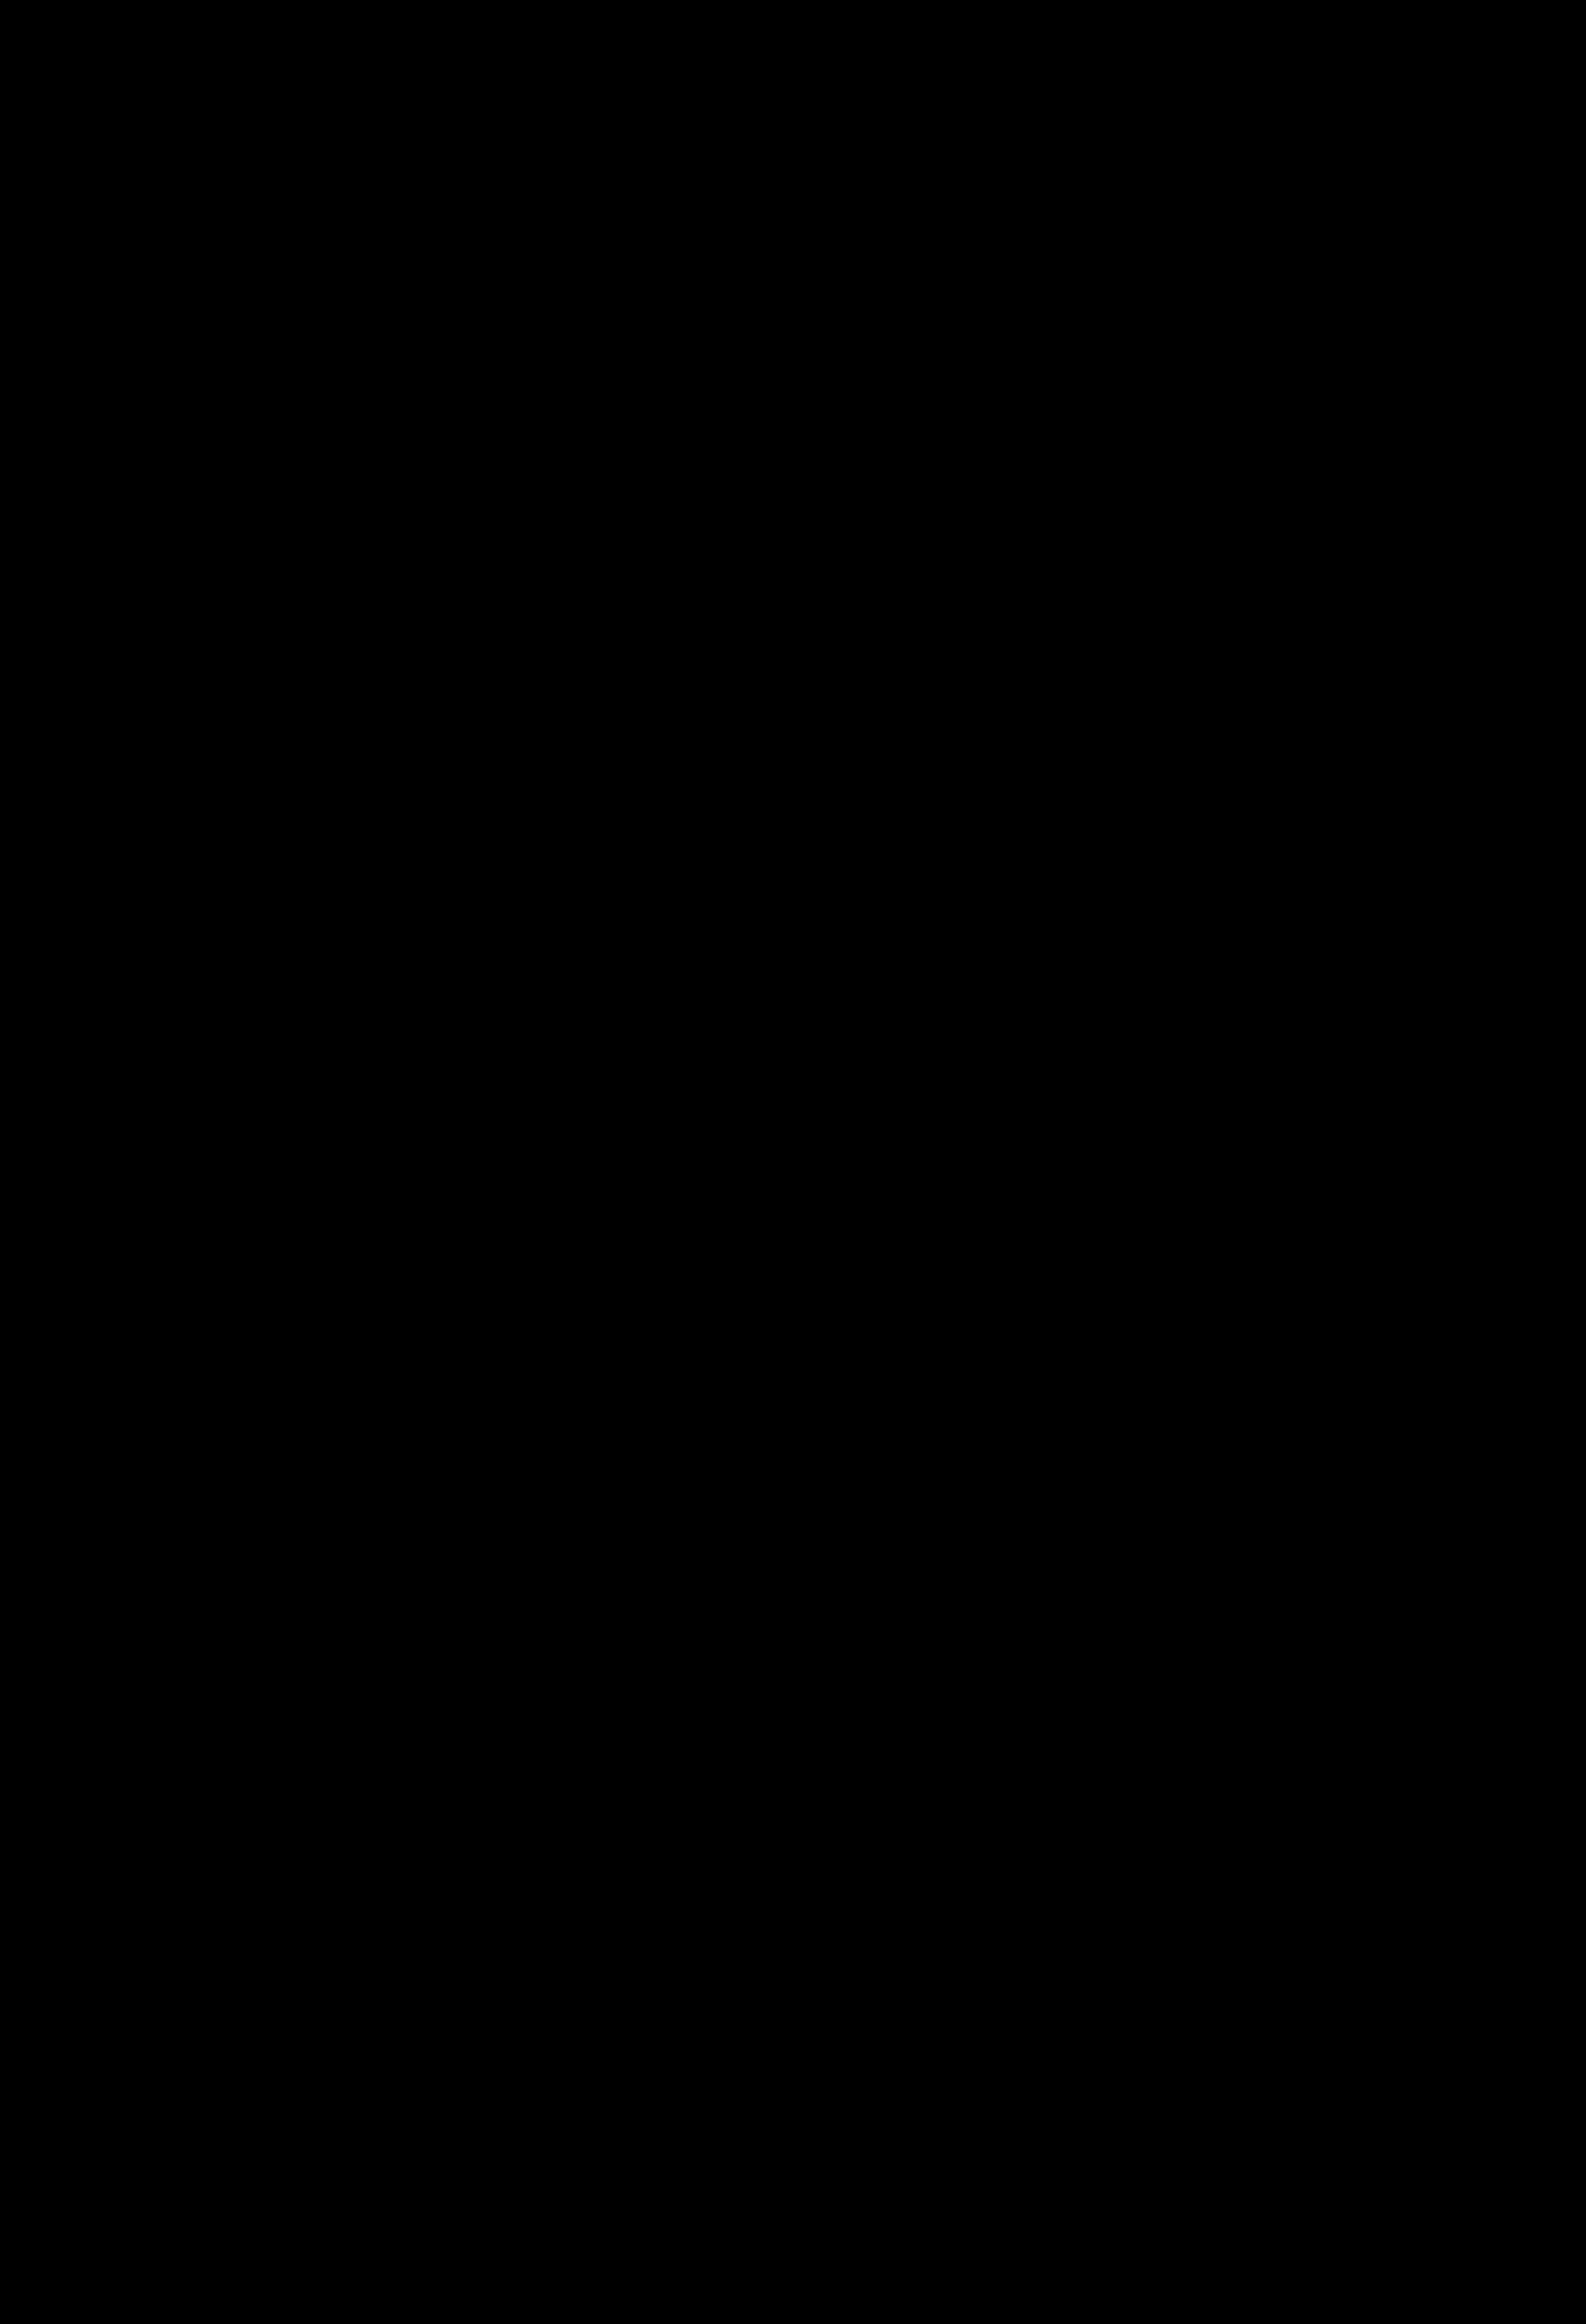 logo-us-p.a.l.m.png